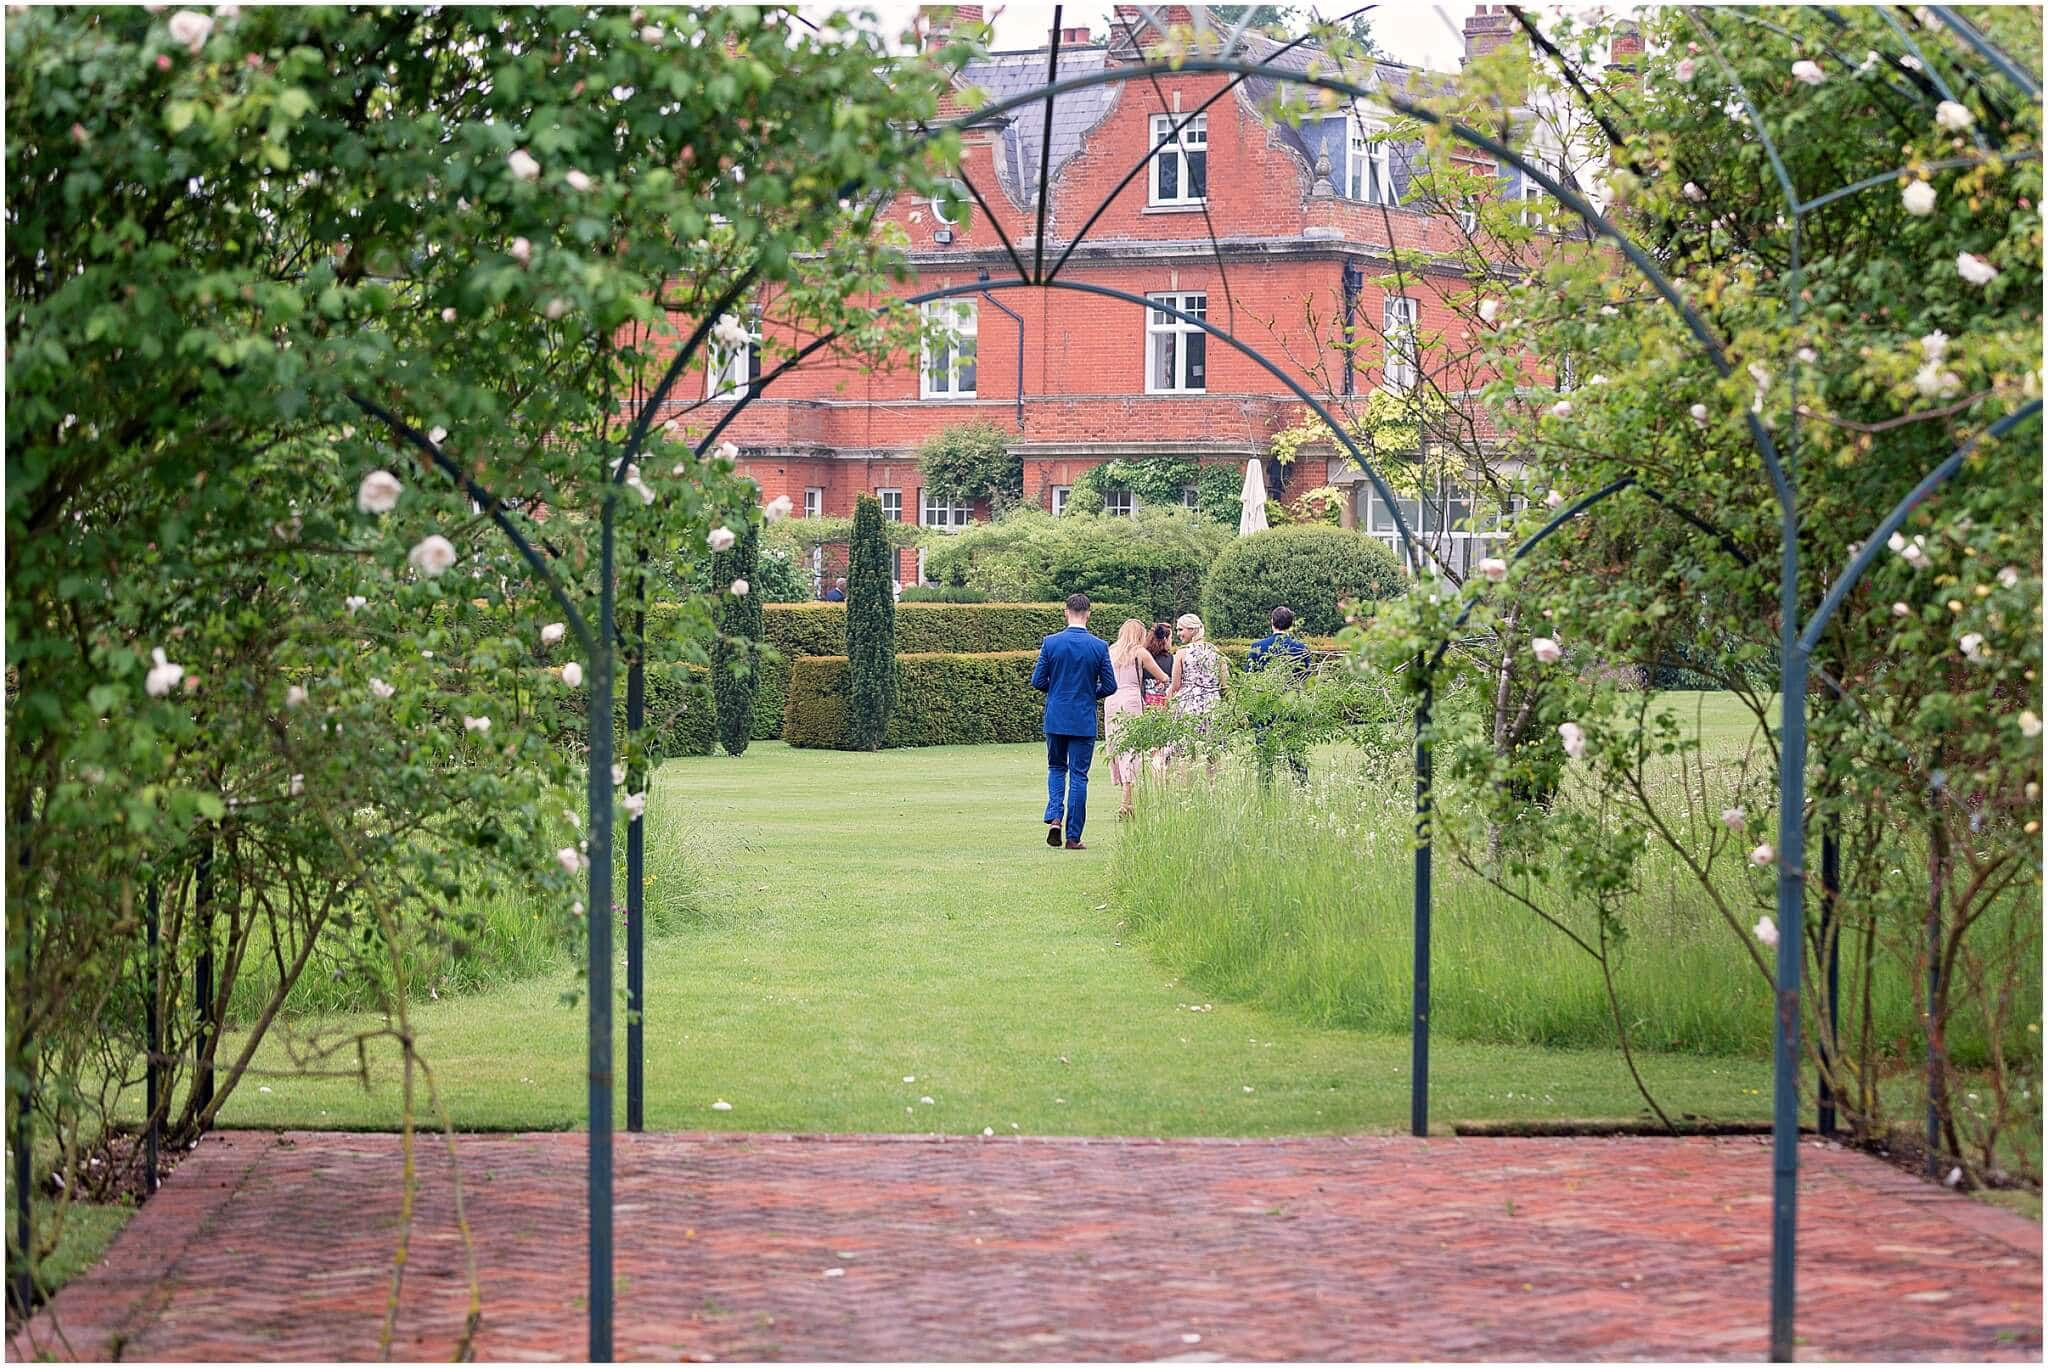 Garden at Chippenham Park